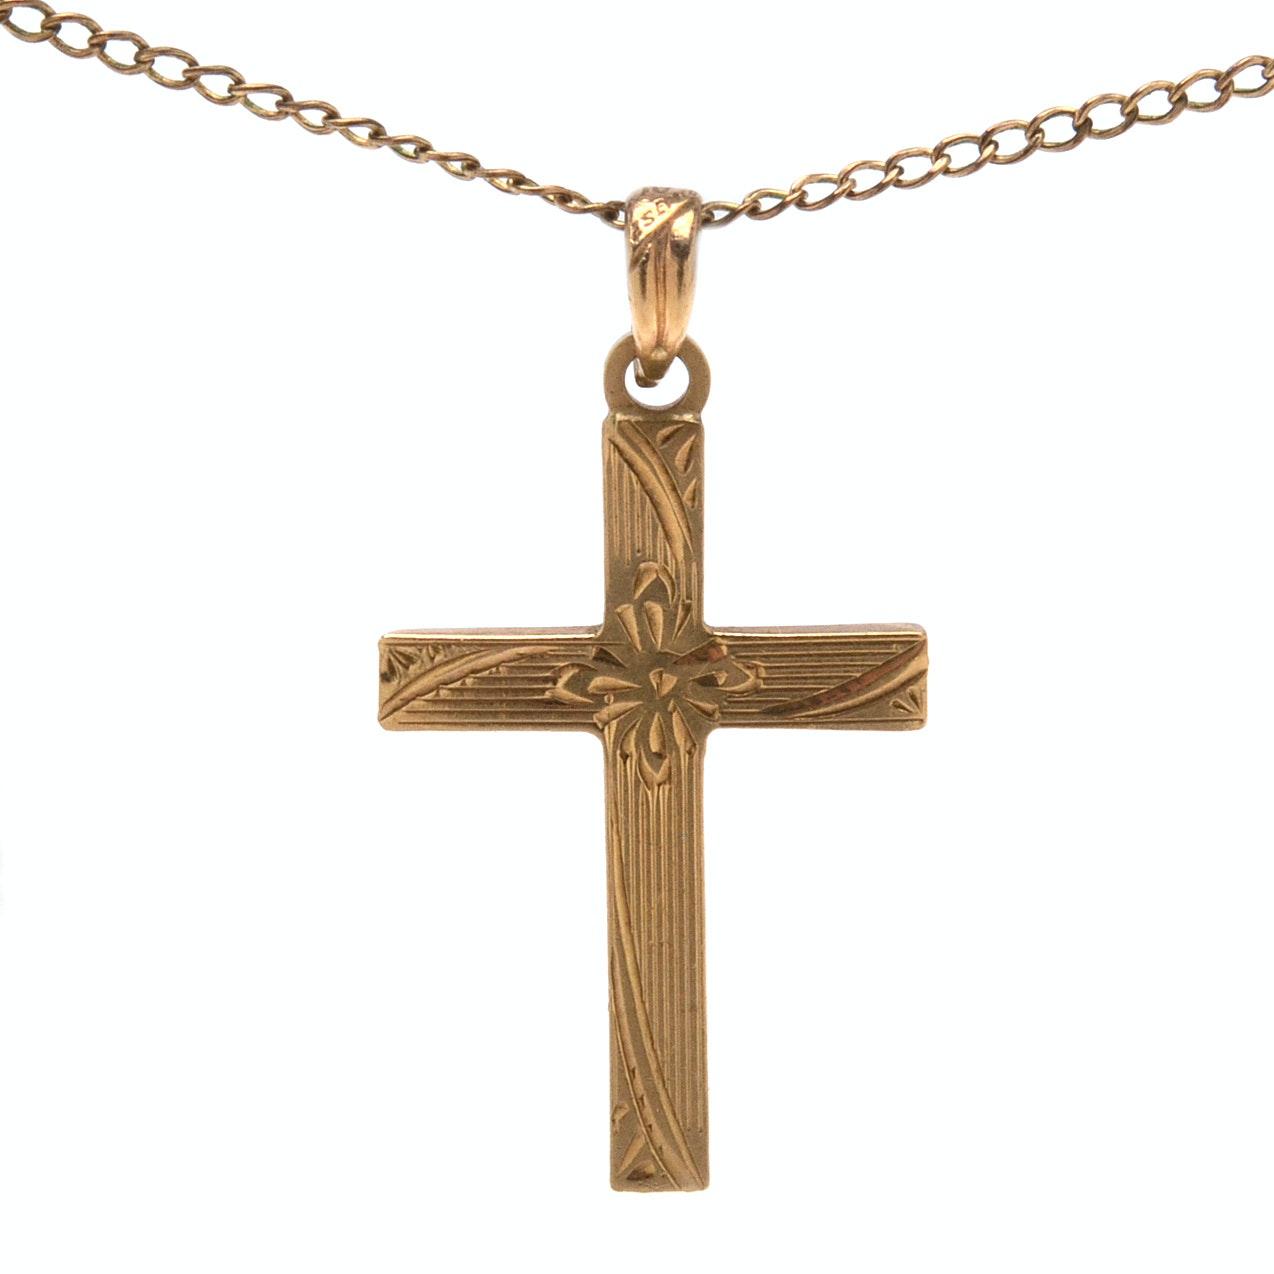 Vintage 10K Esemco Cross Pendant with 14K Gold Chain